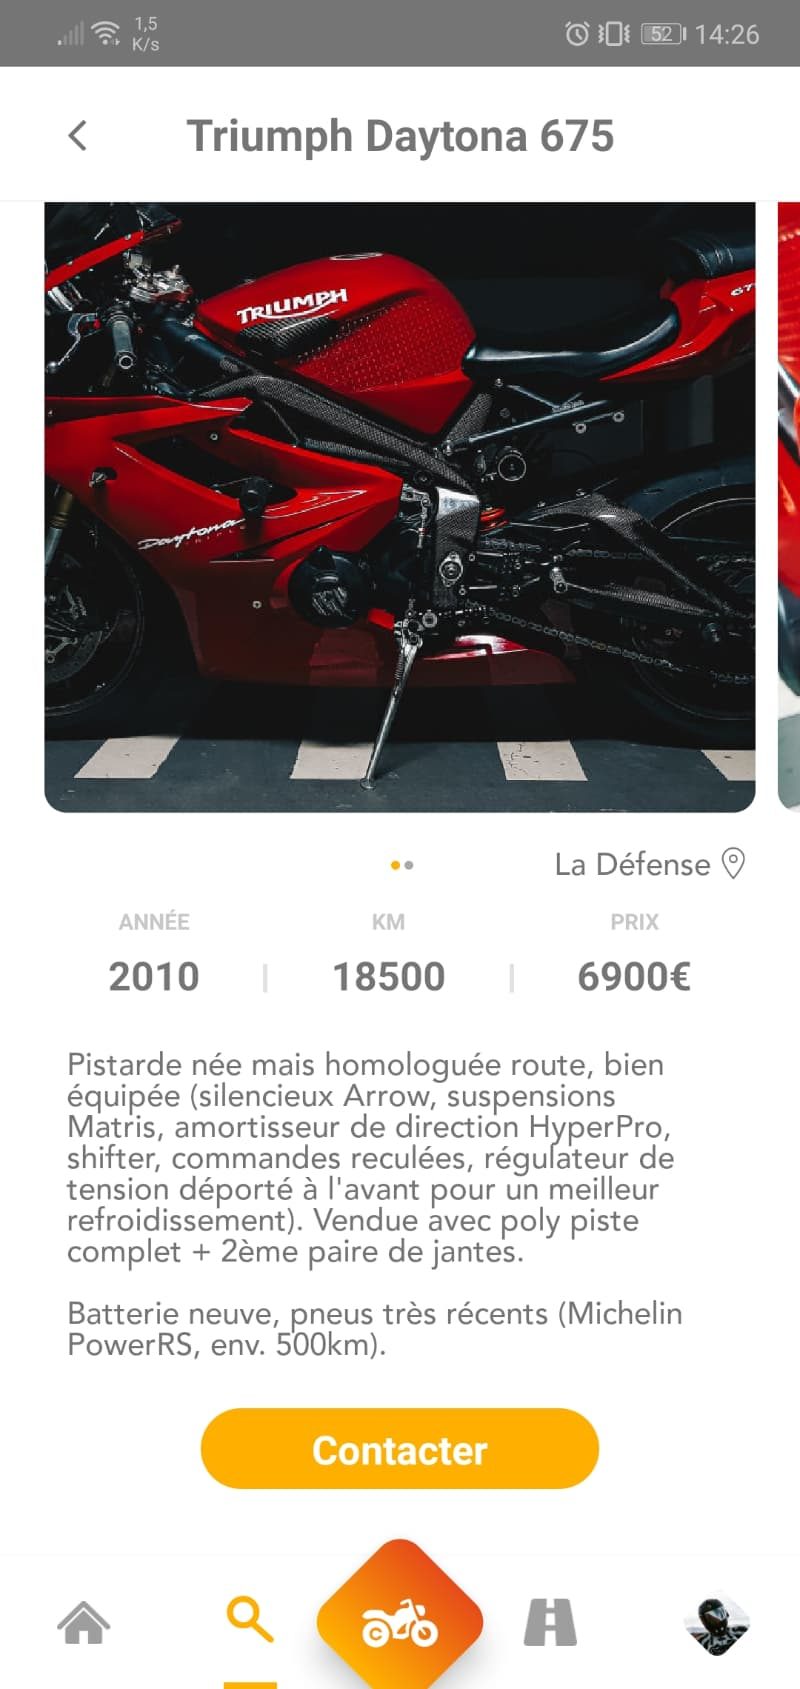 La moto de vos rêves